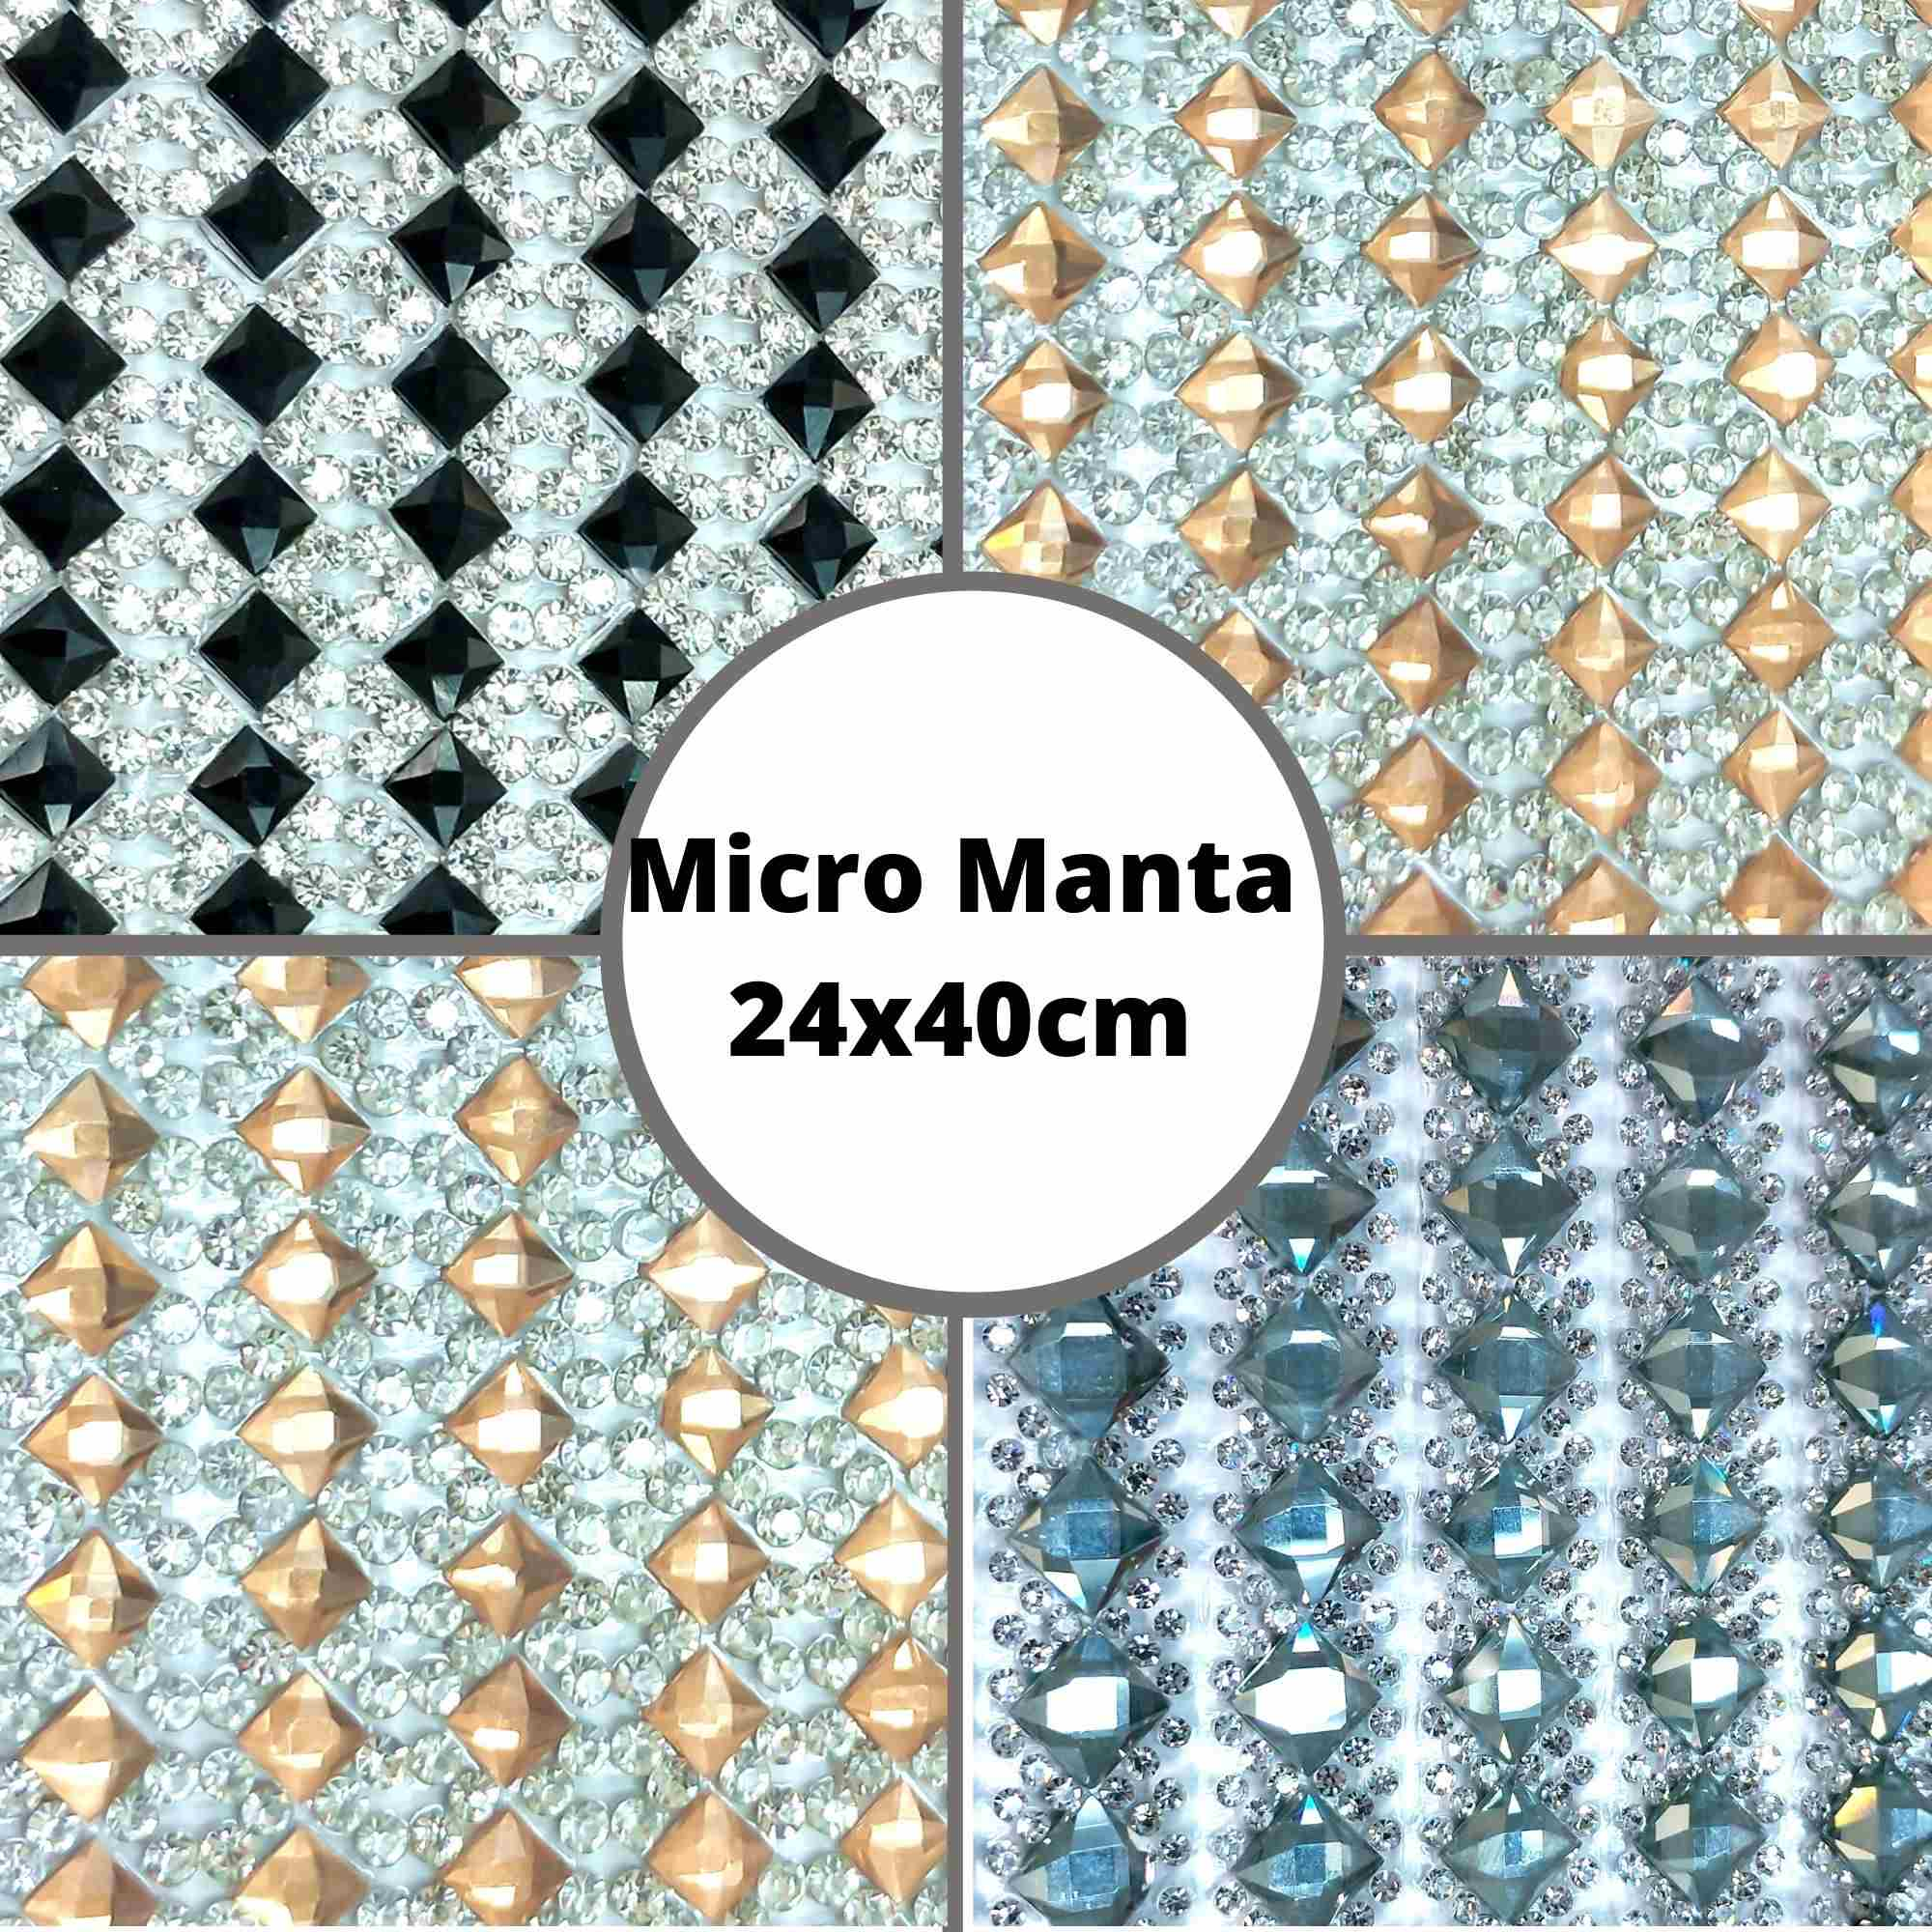 Micro Manta C/Strass Losango - Tamanho 24x40cm - 1 unidade